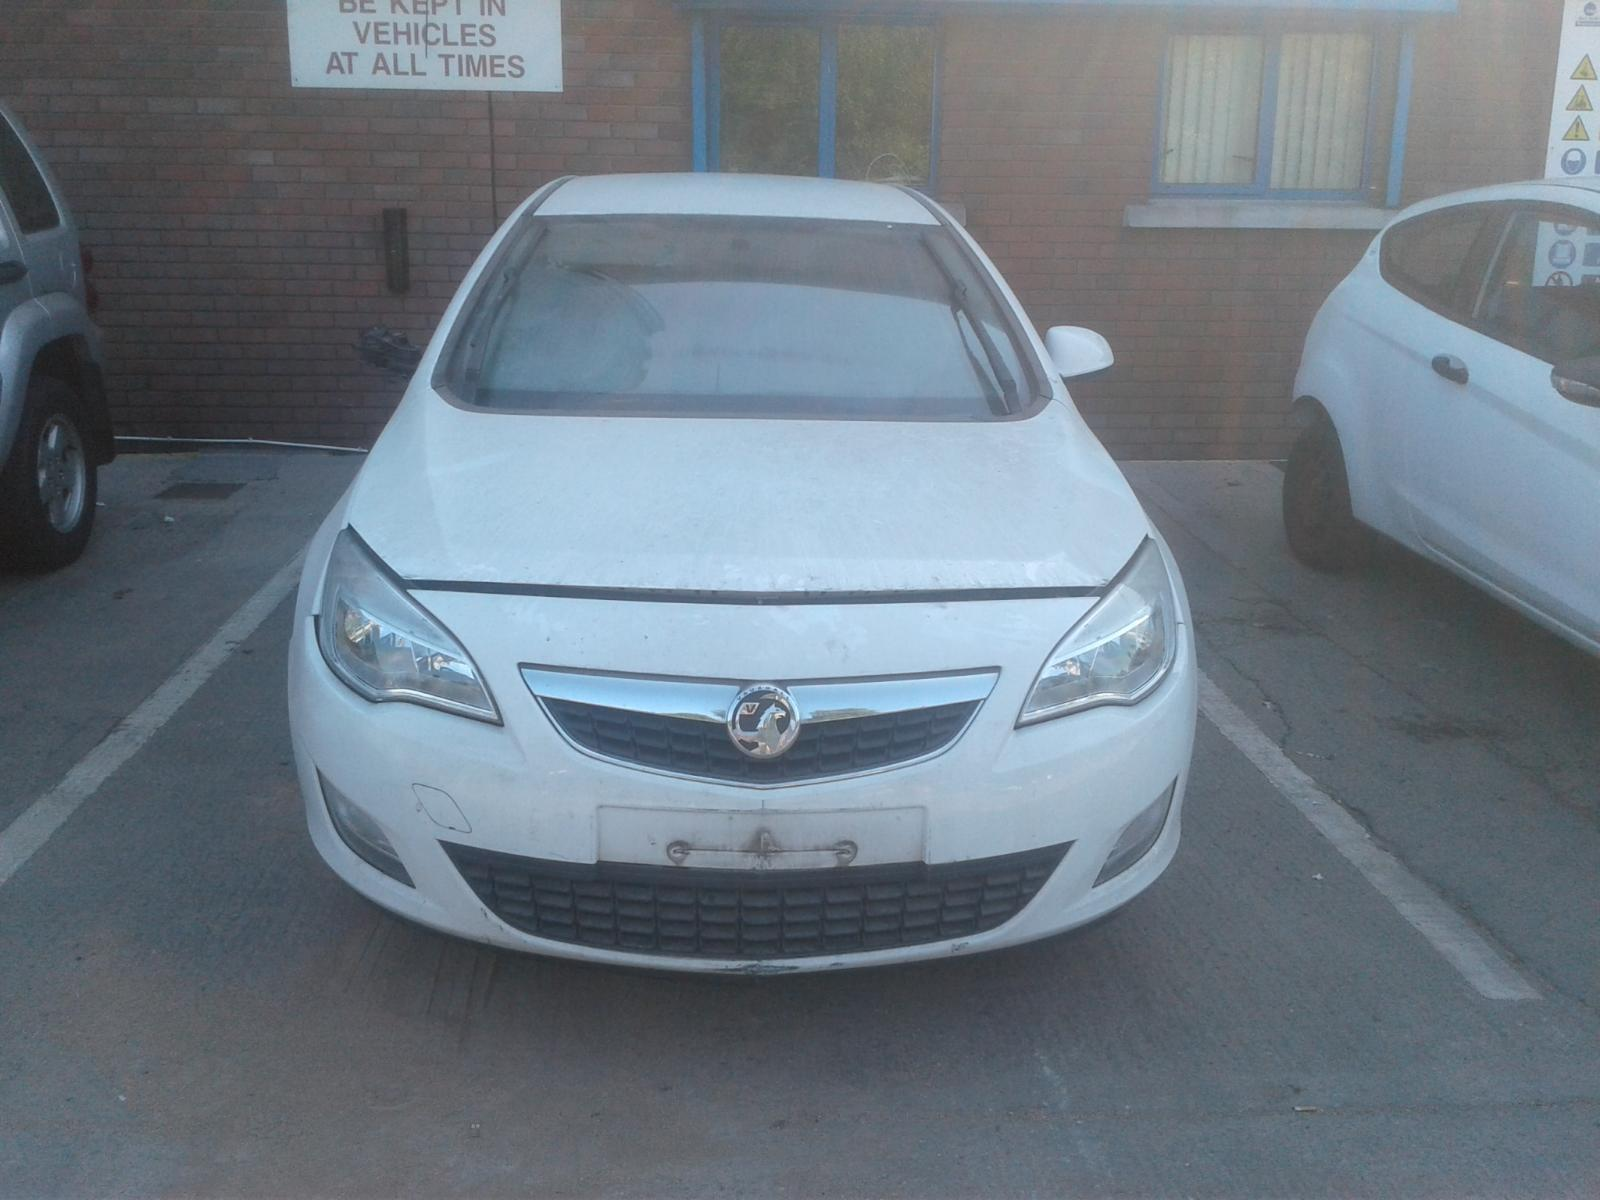 2011 Vauxhall ASTRA Image